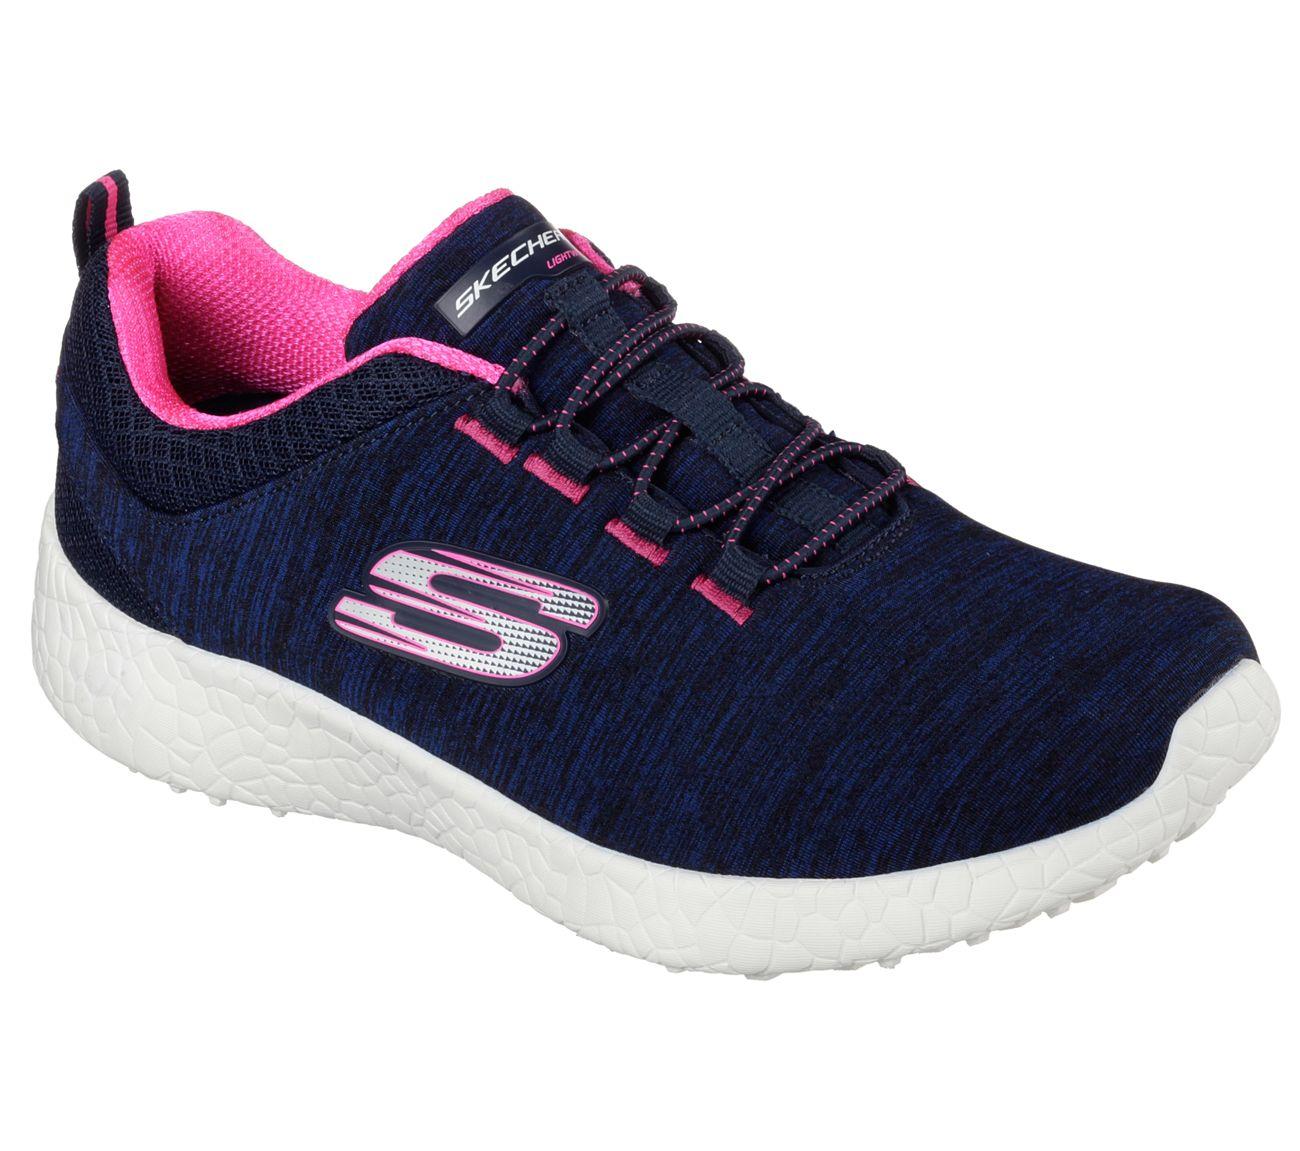 Zapatos Skechers Para Mujer 2016 poker pai gow.es